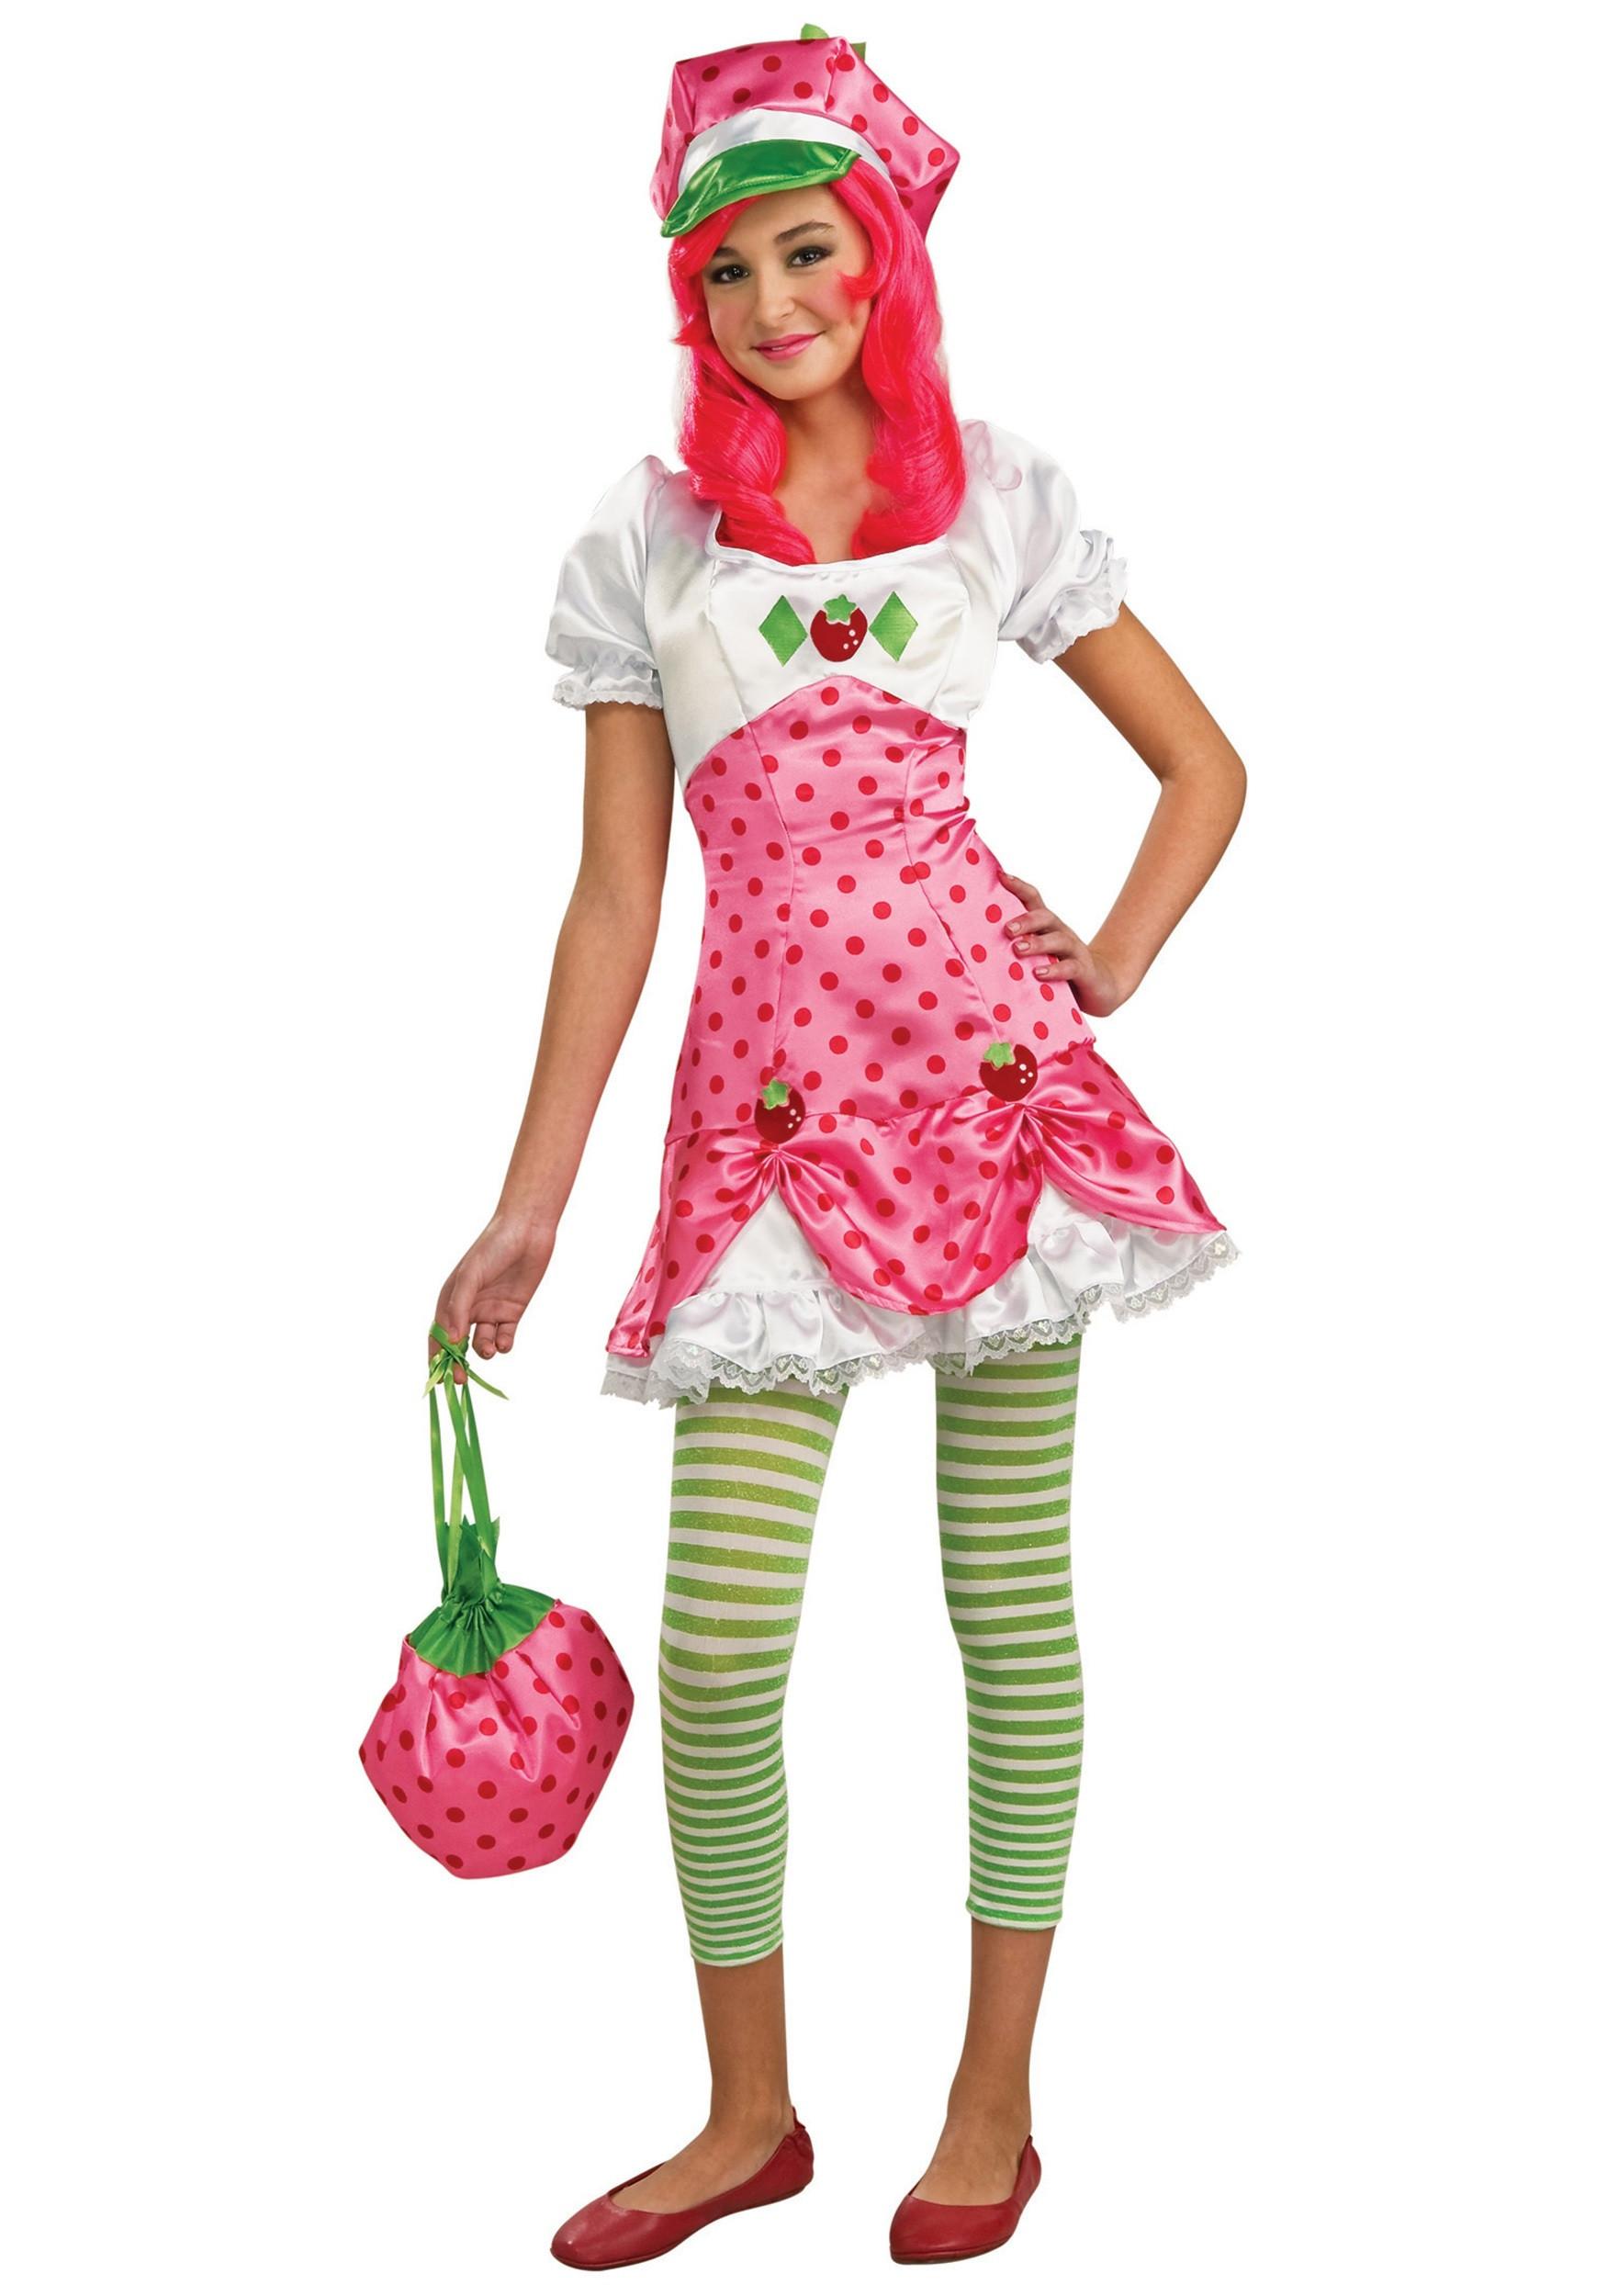 Strawberry Short Cake Halloween  Deluxe Strawberry Shortcake Costume Kids Tween Halloween